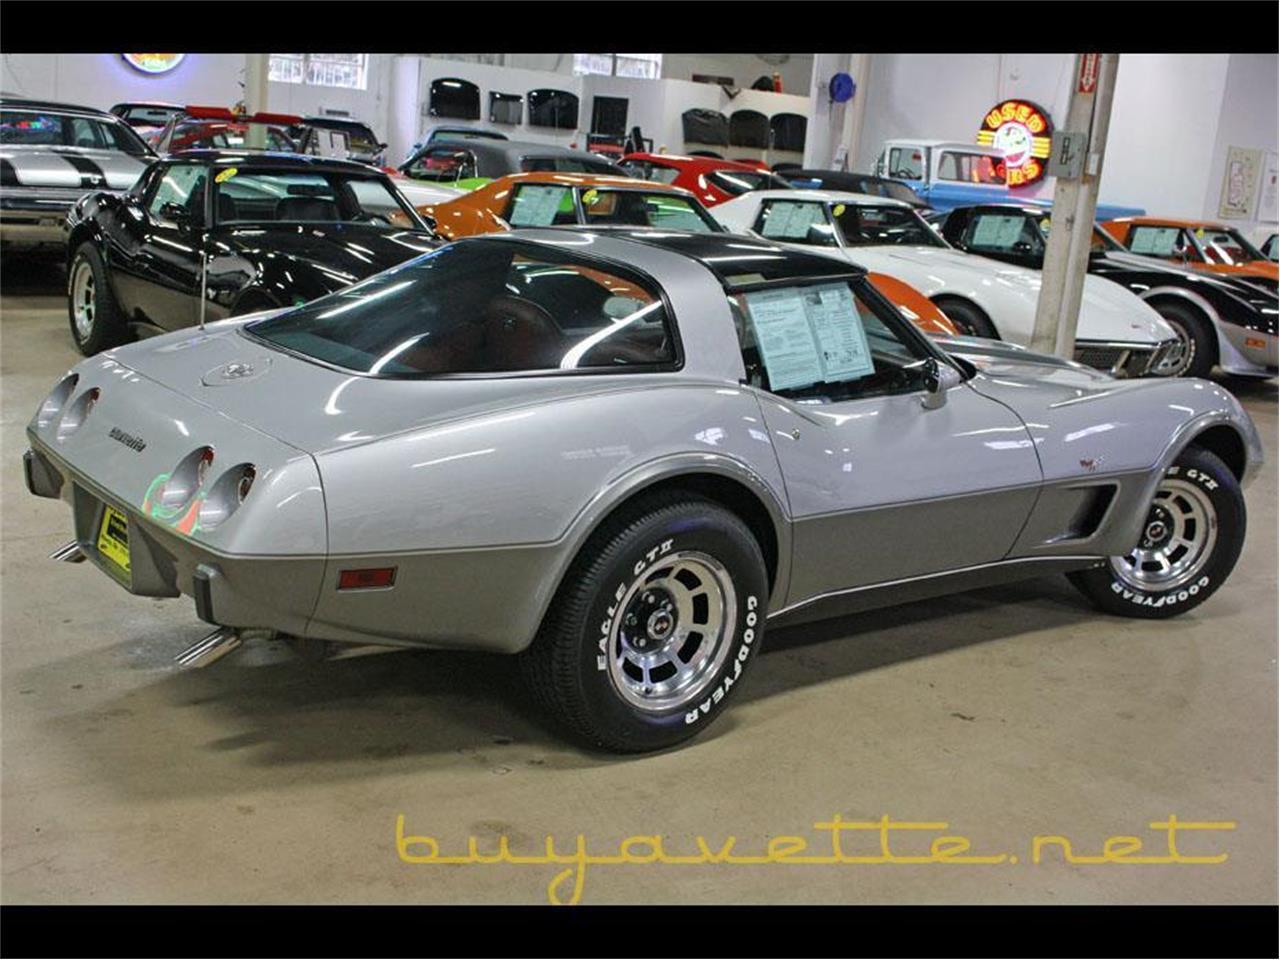 Large Picture of '78 Chevrolet Corvette - $19,999.00 - R10M